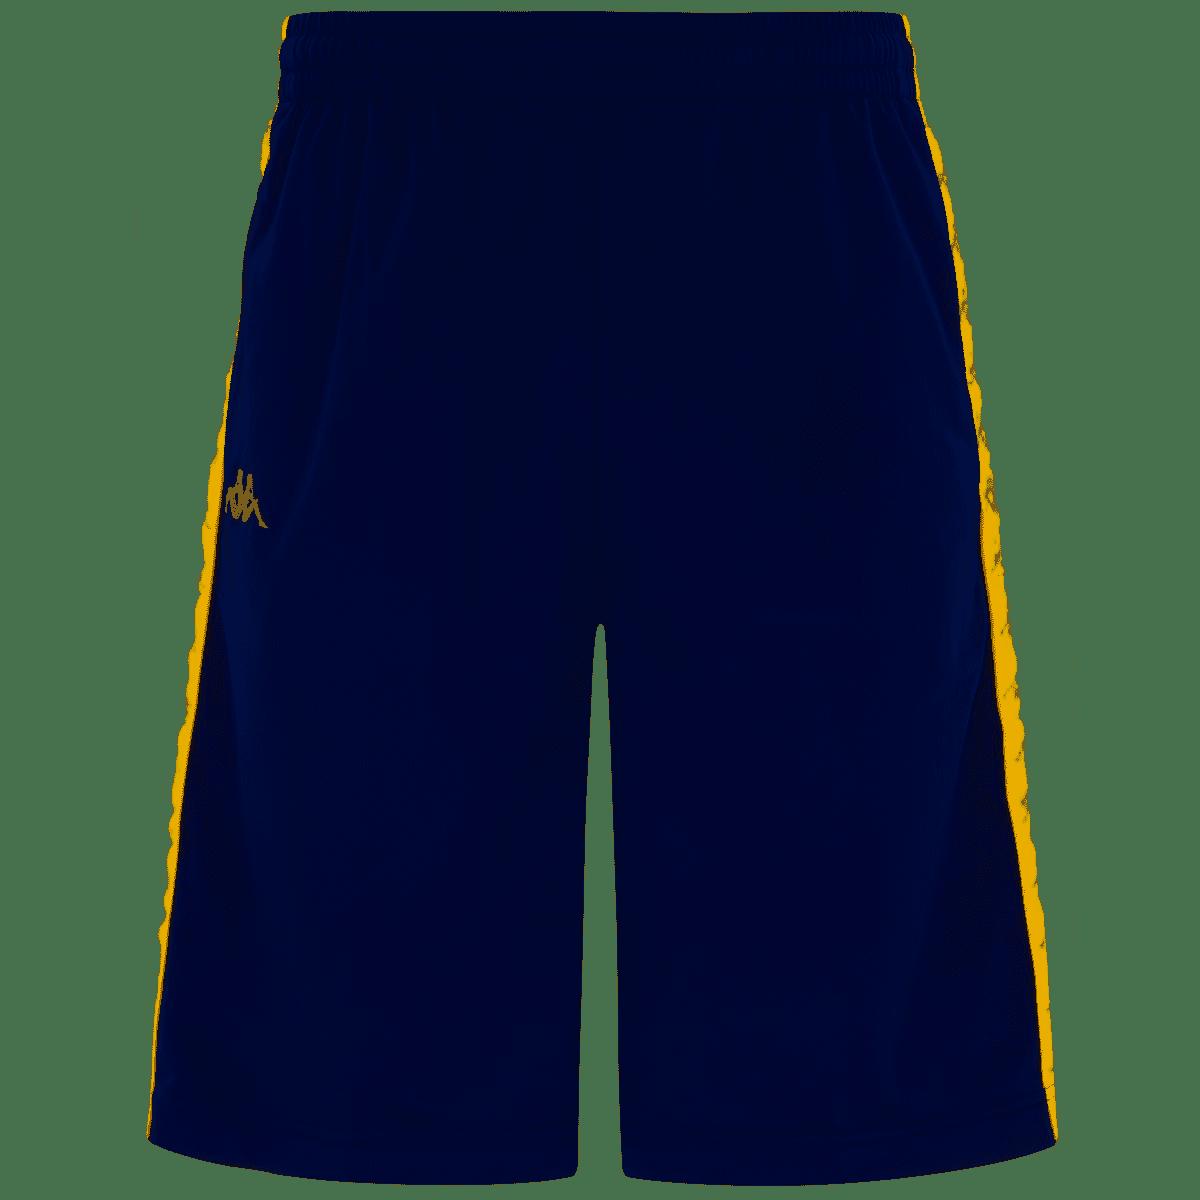 Kappa 222 Banda Snapswell - Pantaloncini da Uomo